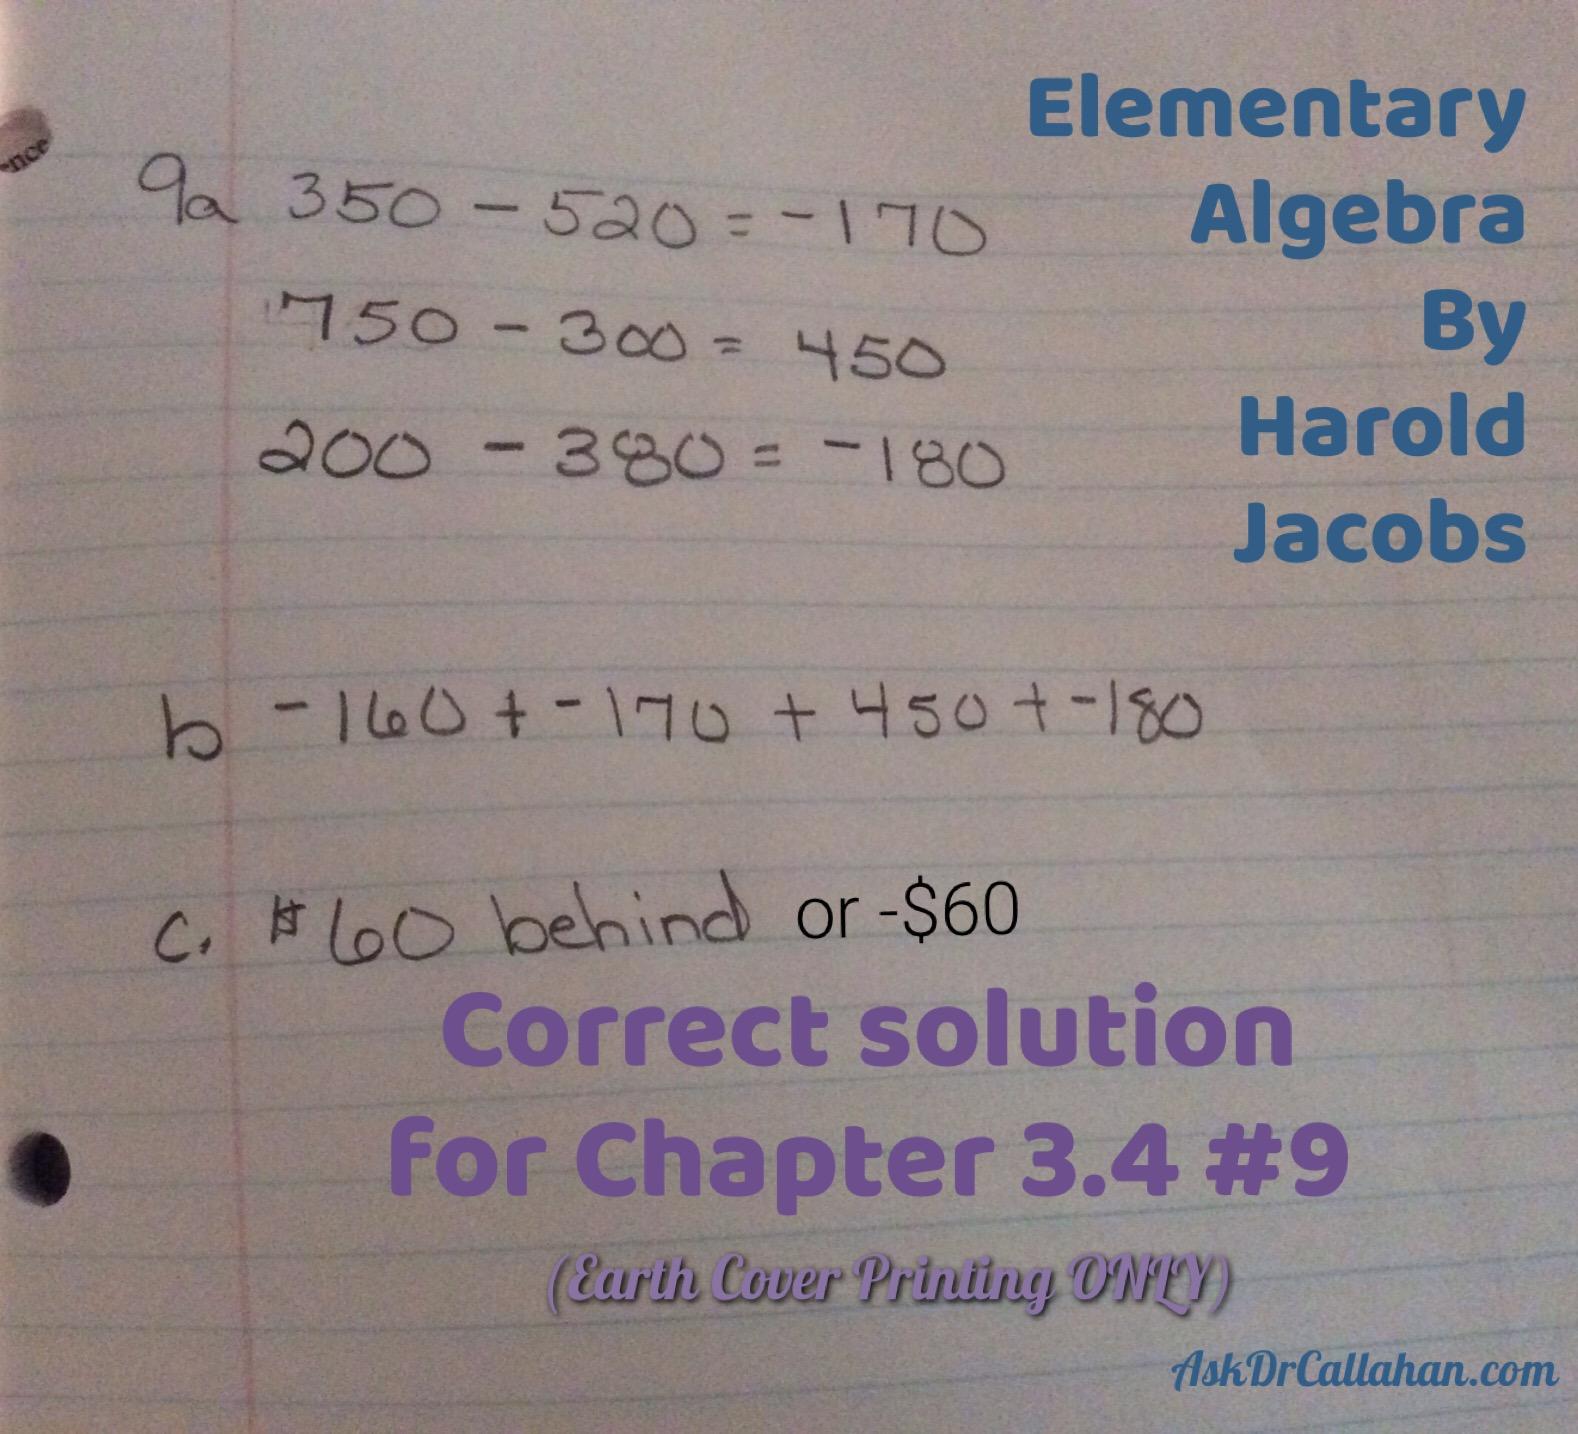 Known Algebra Errors Archives - AskDrCallahan